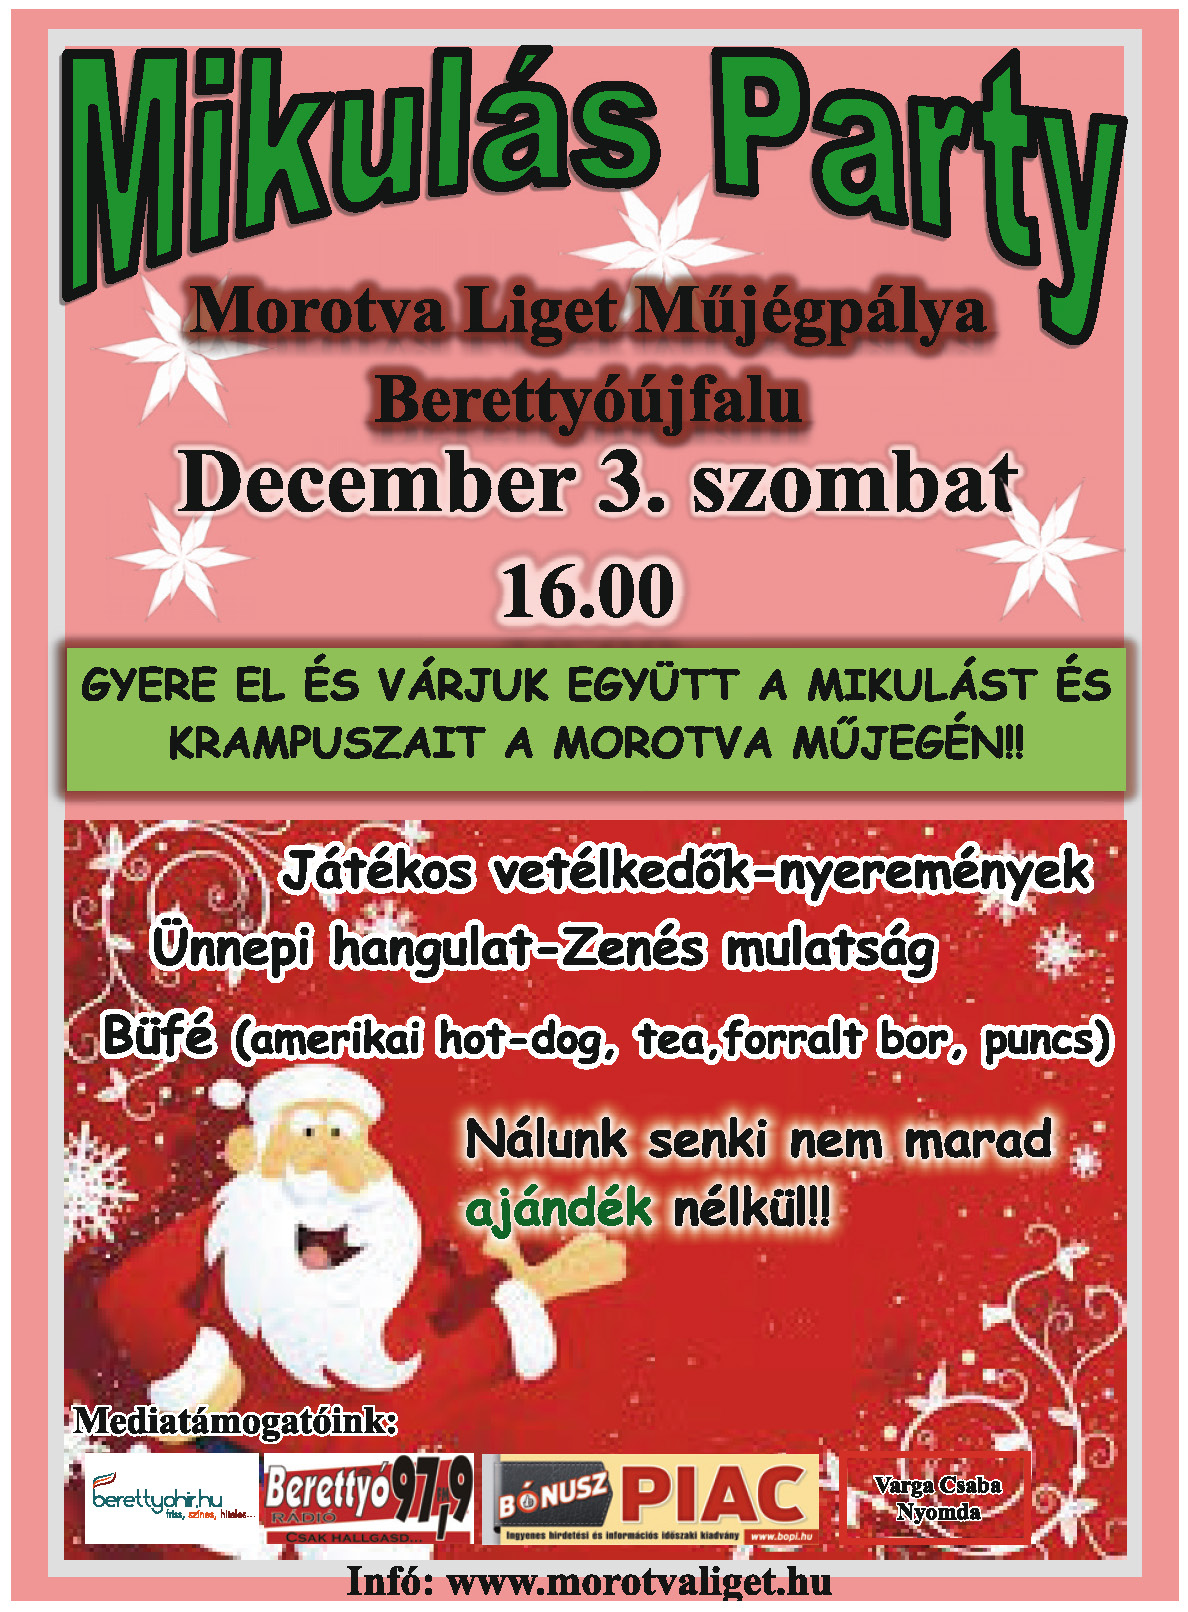 mikulas-party-1